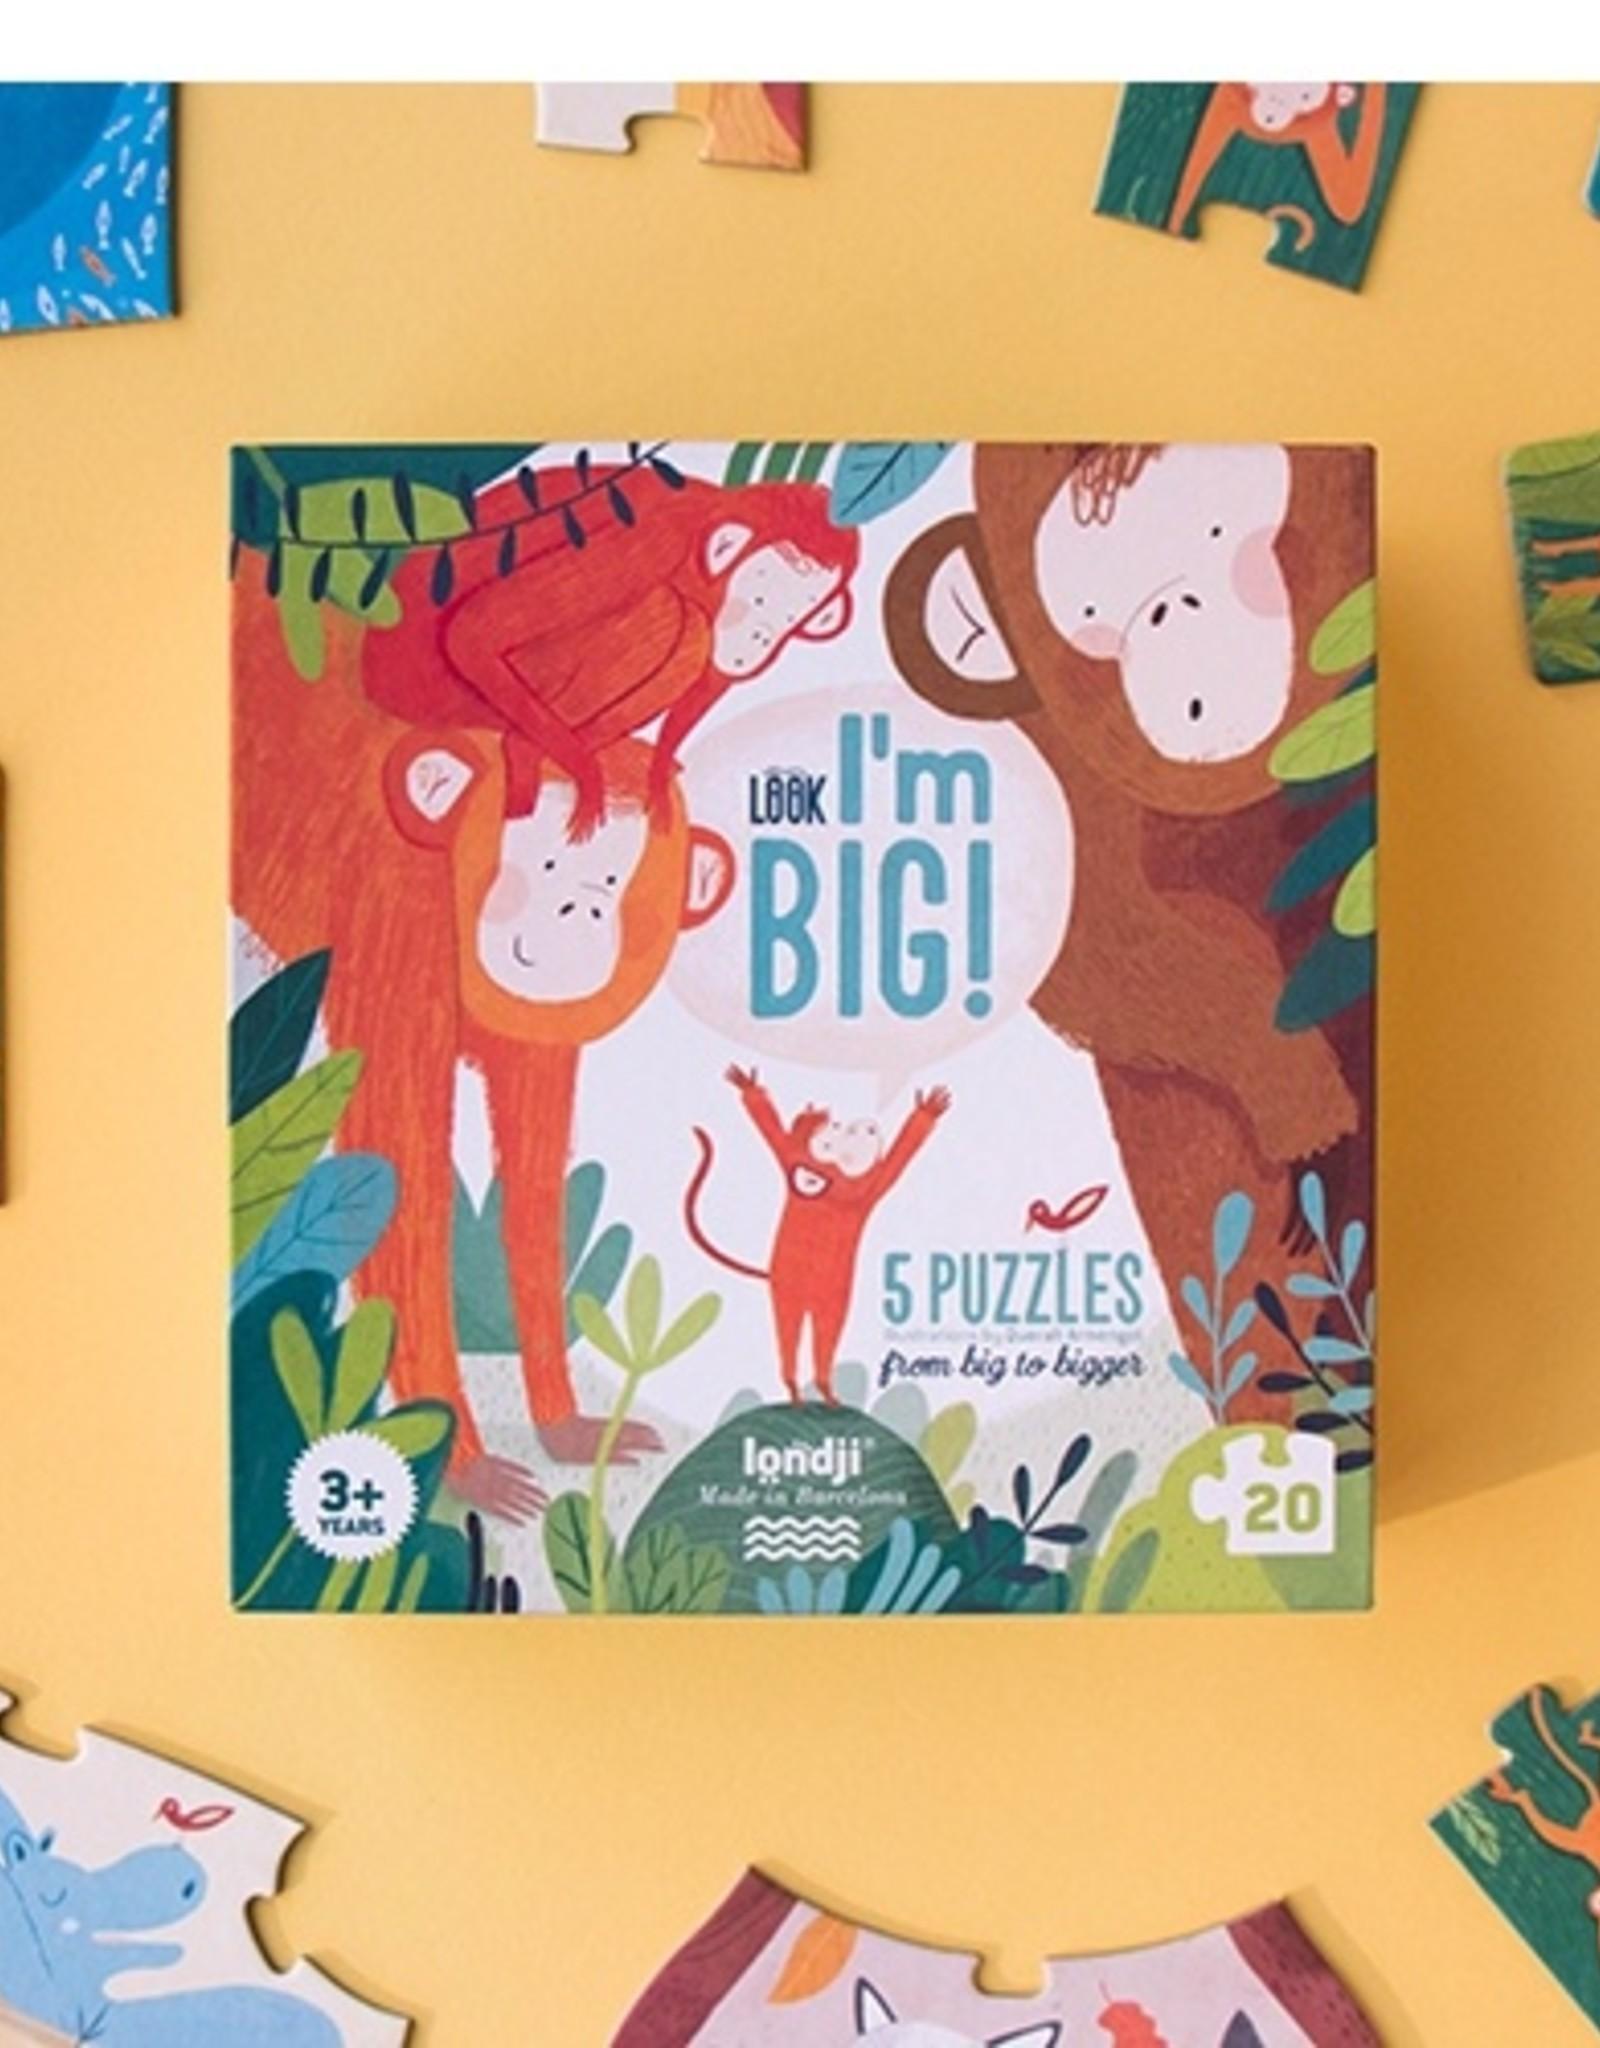 LONDJI BARCELONA Londji puzzel - Look! I'm big